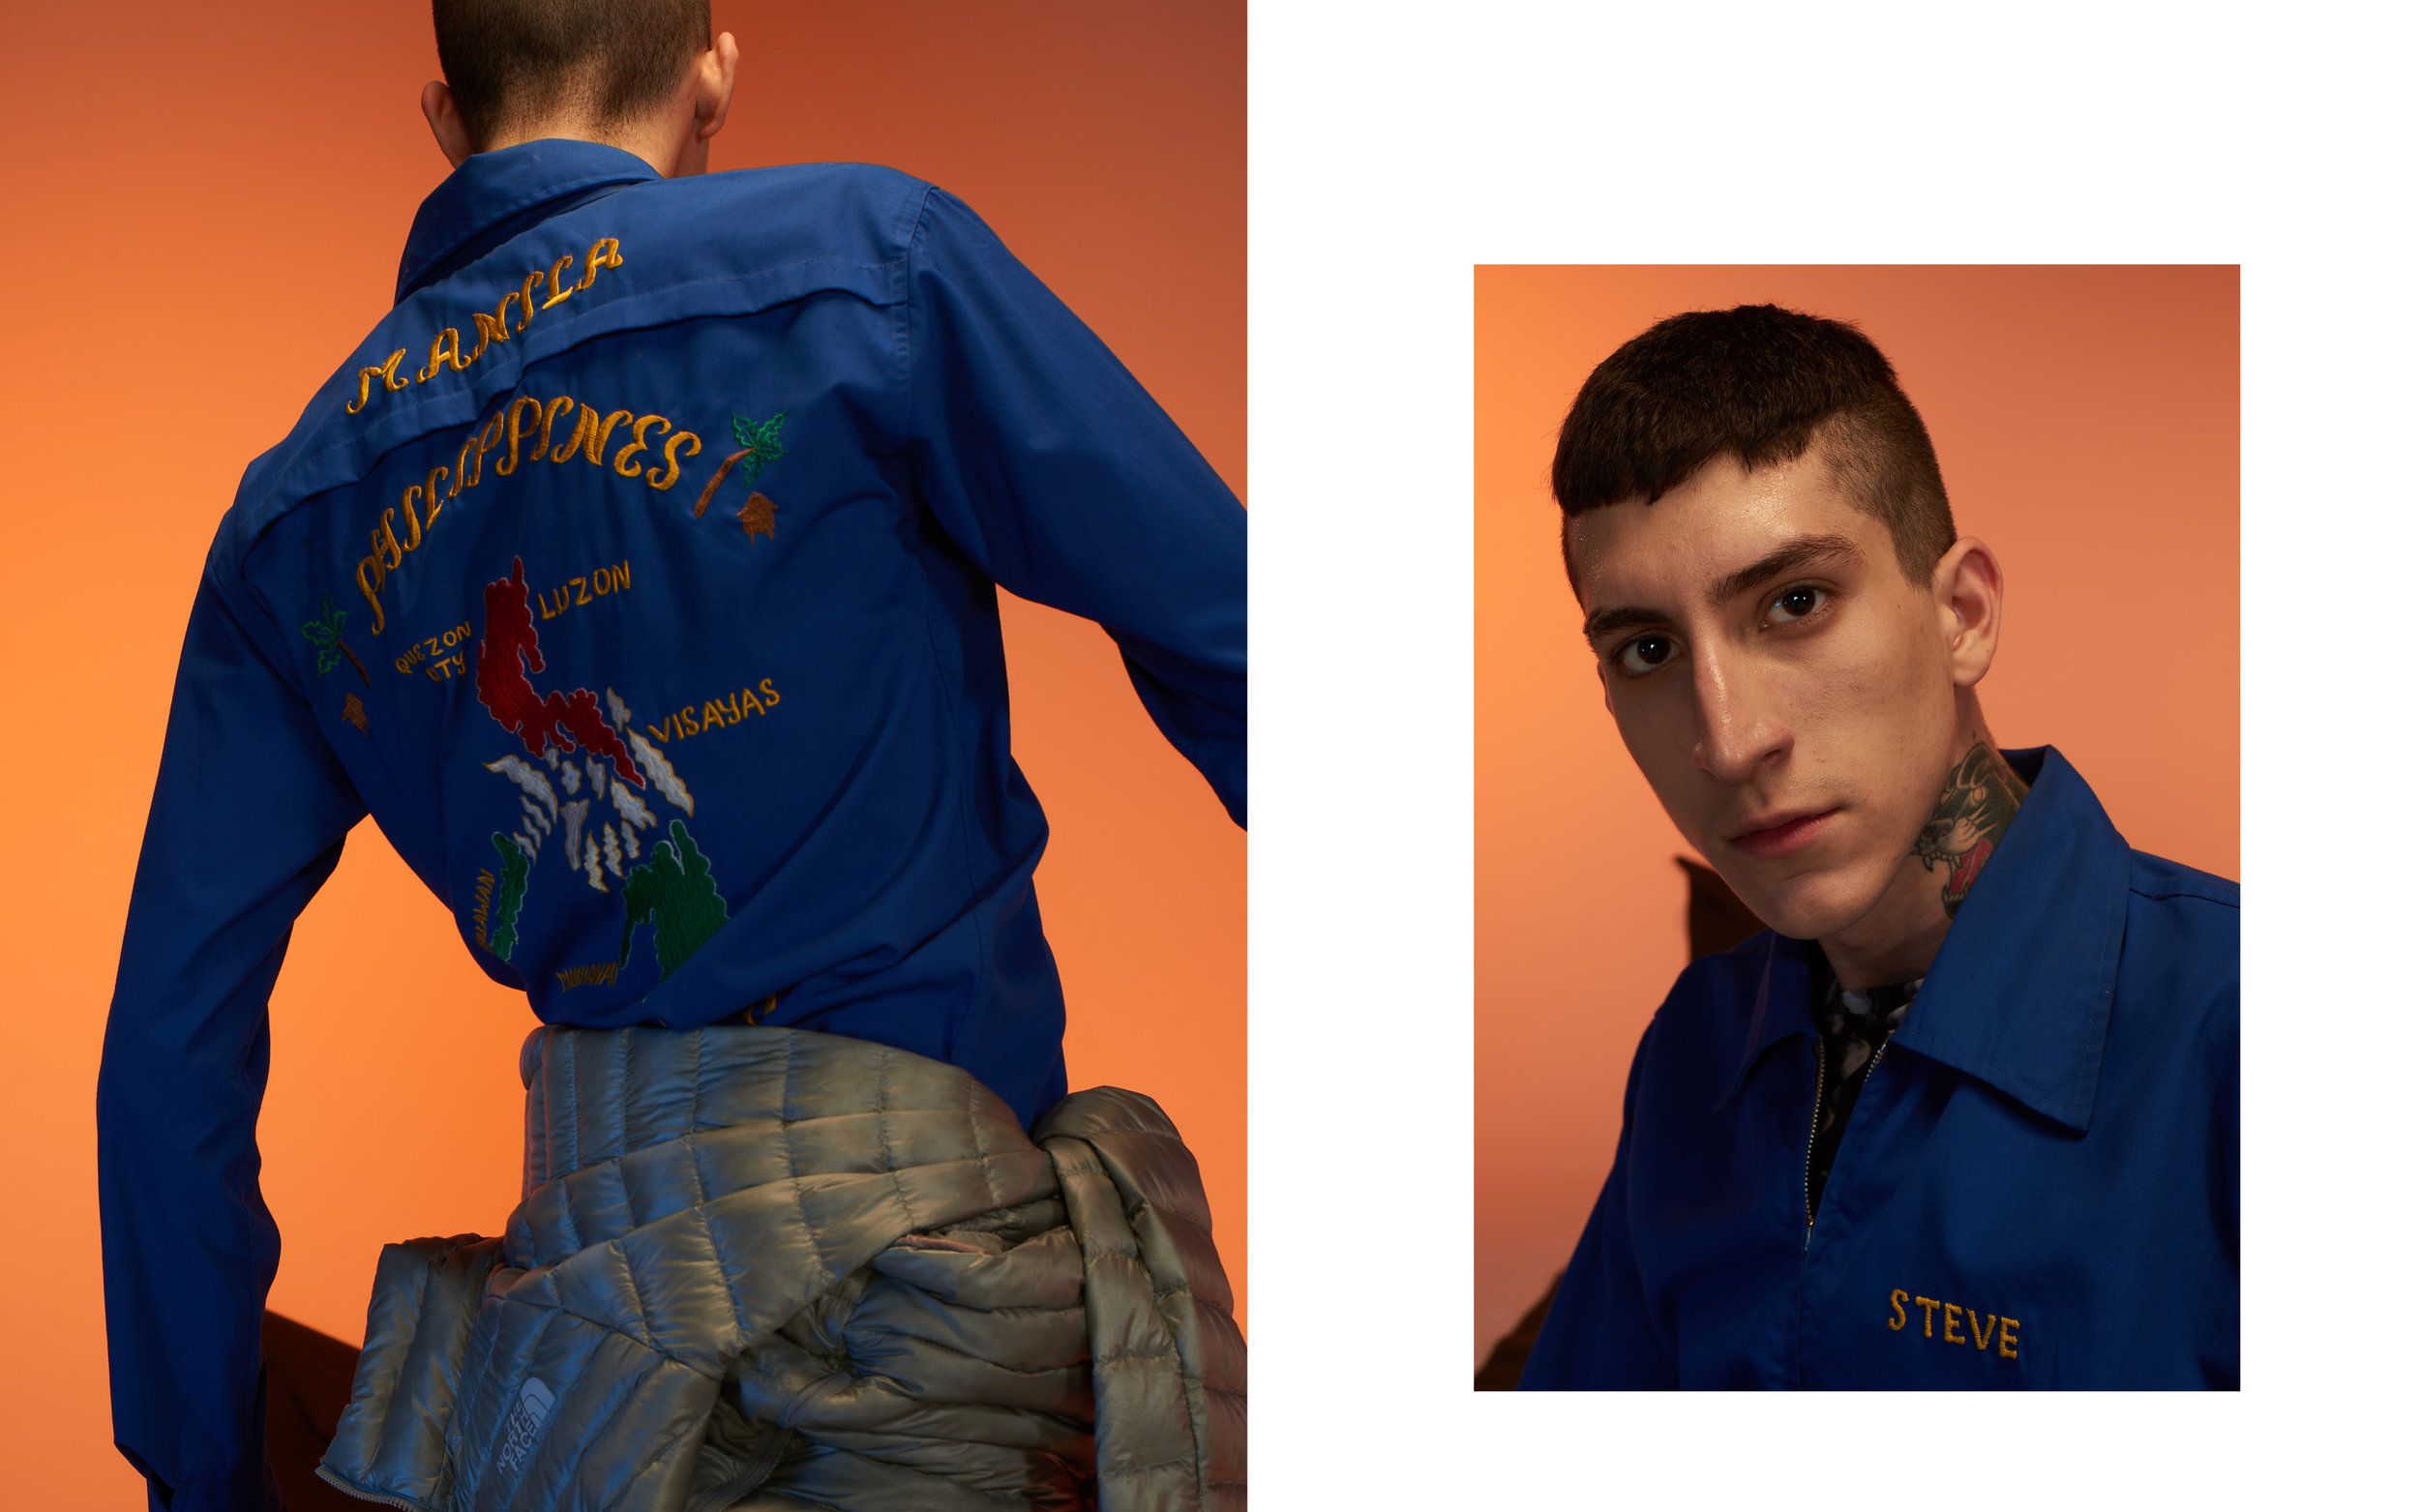 Rick veste Blusa p&b adidas,Jaqueta B.Luxo e Jaqueta The north face